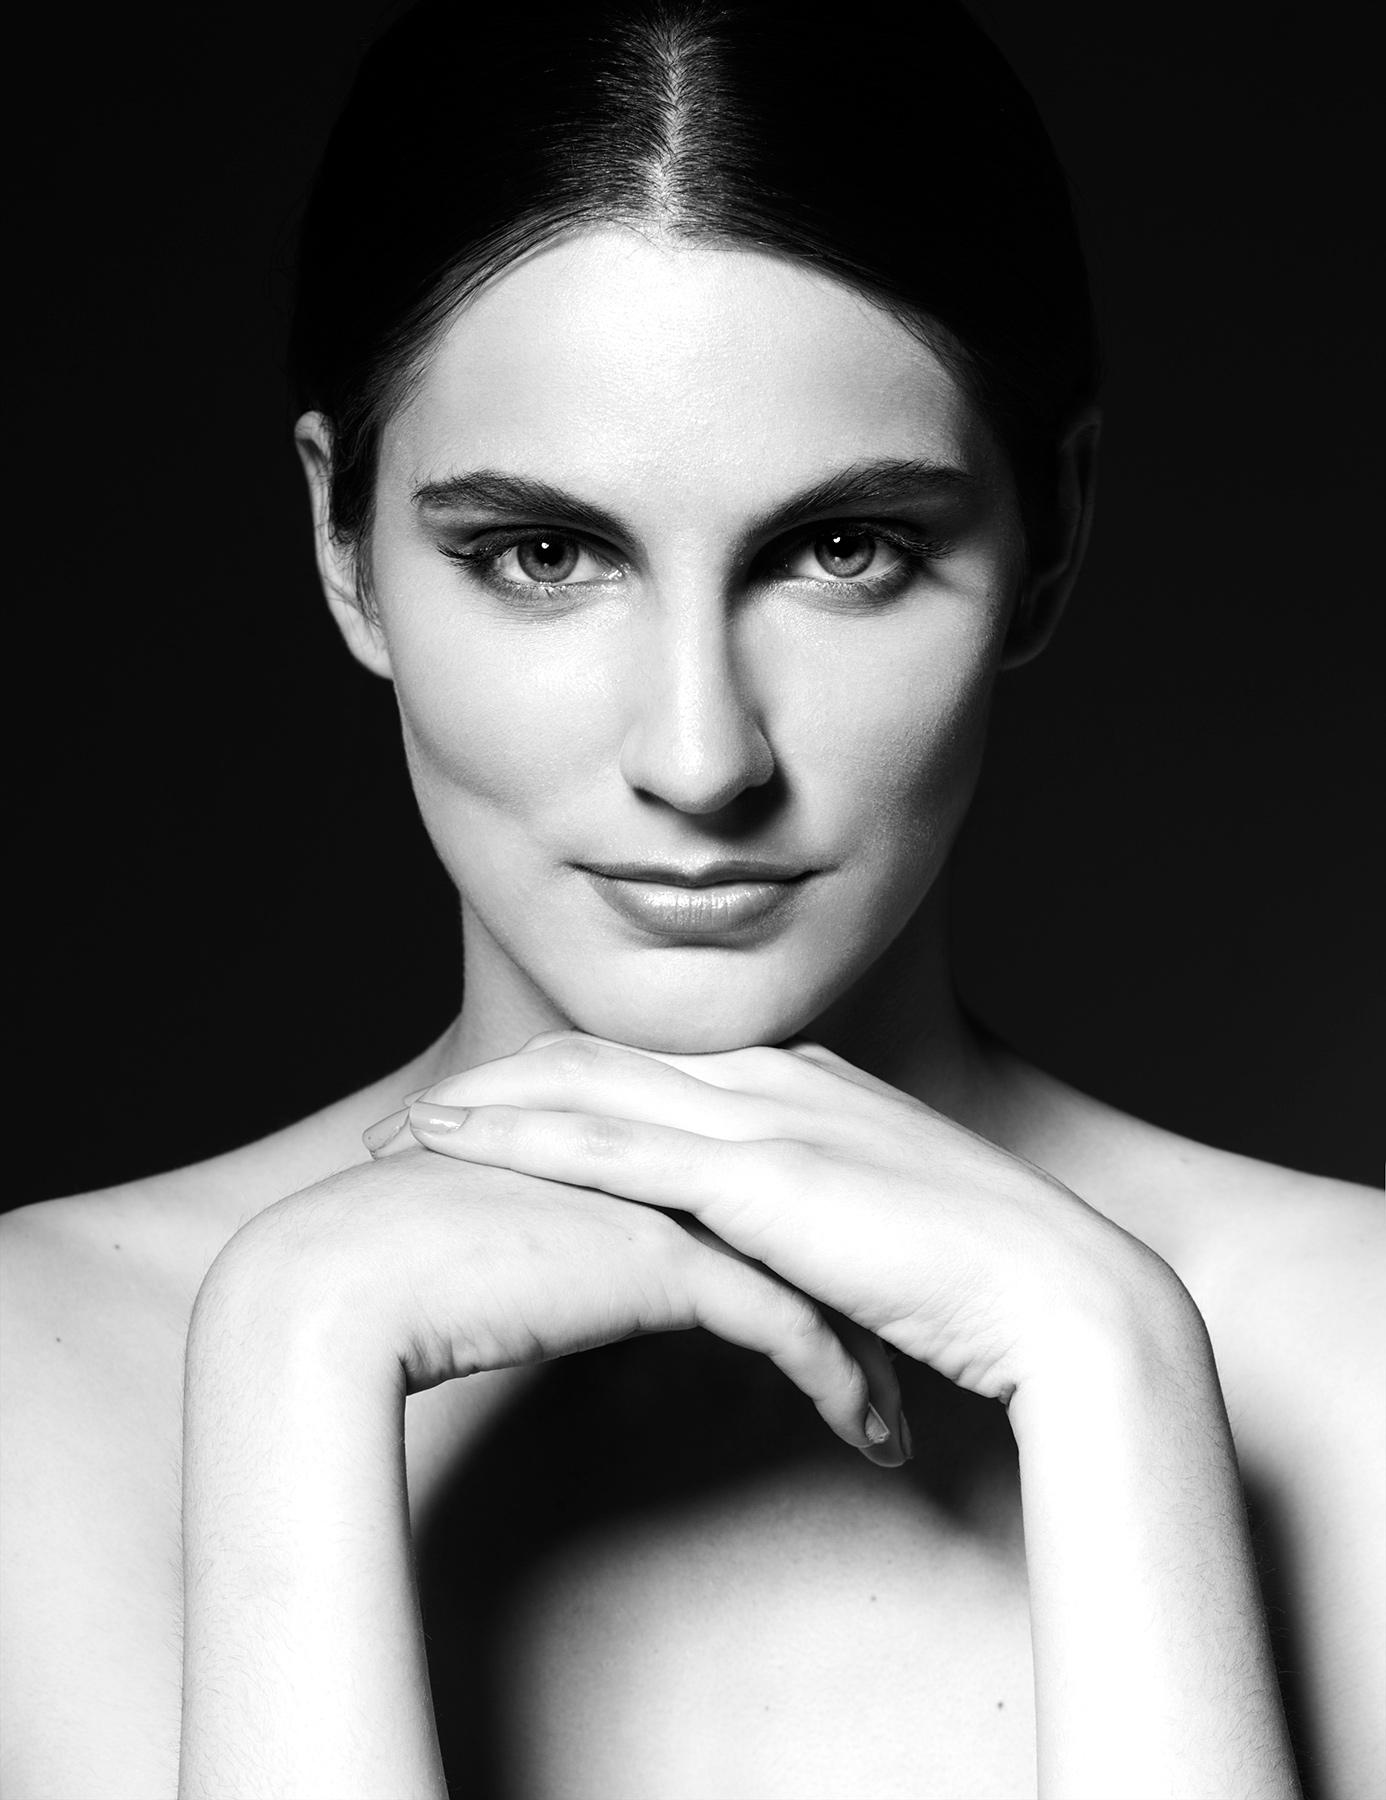 Черно-белый портрет, фотограф: Александр Сакулин